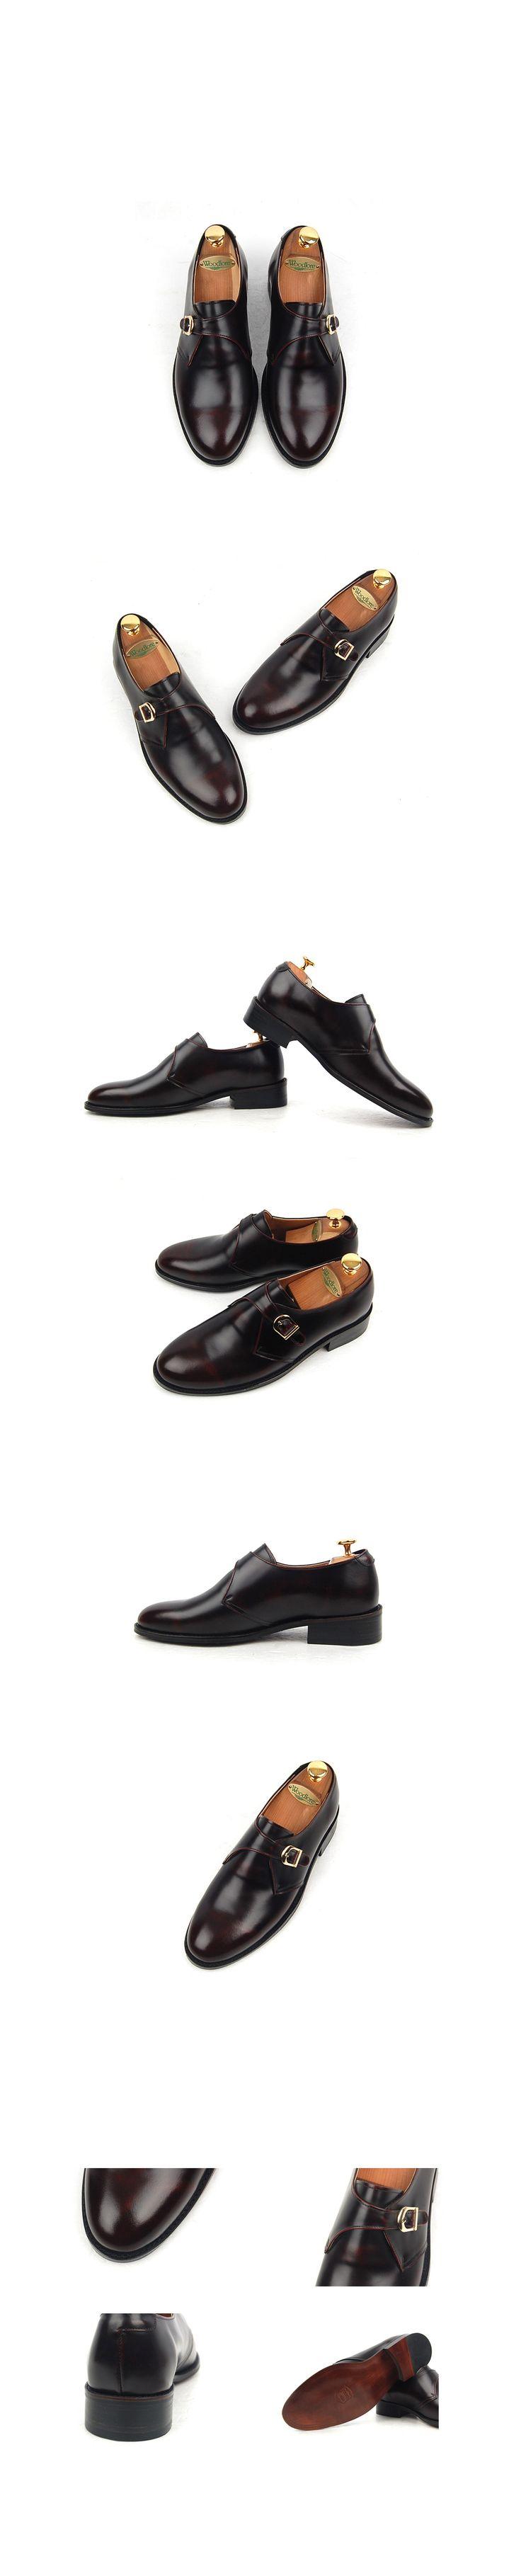 H3THECLASSIC loafer shoes man fashion #h3theclassicl#handmadeshoes#shoes#madeinkorea#instashoes#classic#menshoes#oxford#h3theclassic#fashion#custom#handmade#mensshoes#instashoe#손신발#에이치쓰리더클래식#수제화#남성수제화#남자수제화#커스텀#남자구두#핸드메이드#신스타그램#맞춤#클리퍼#남성클리퍼#남자로퍼#맞춤클리퍼#fashionaddict#dailystyle#instafashion#ootd#ootdmagazine#lookbook#streetchic#데일리룩#OX-2054PUA www.h3theclassic.com